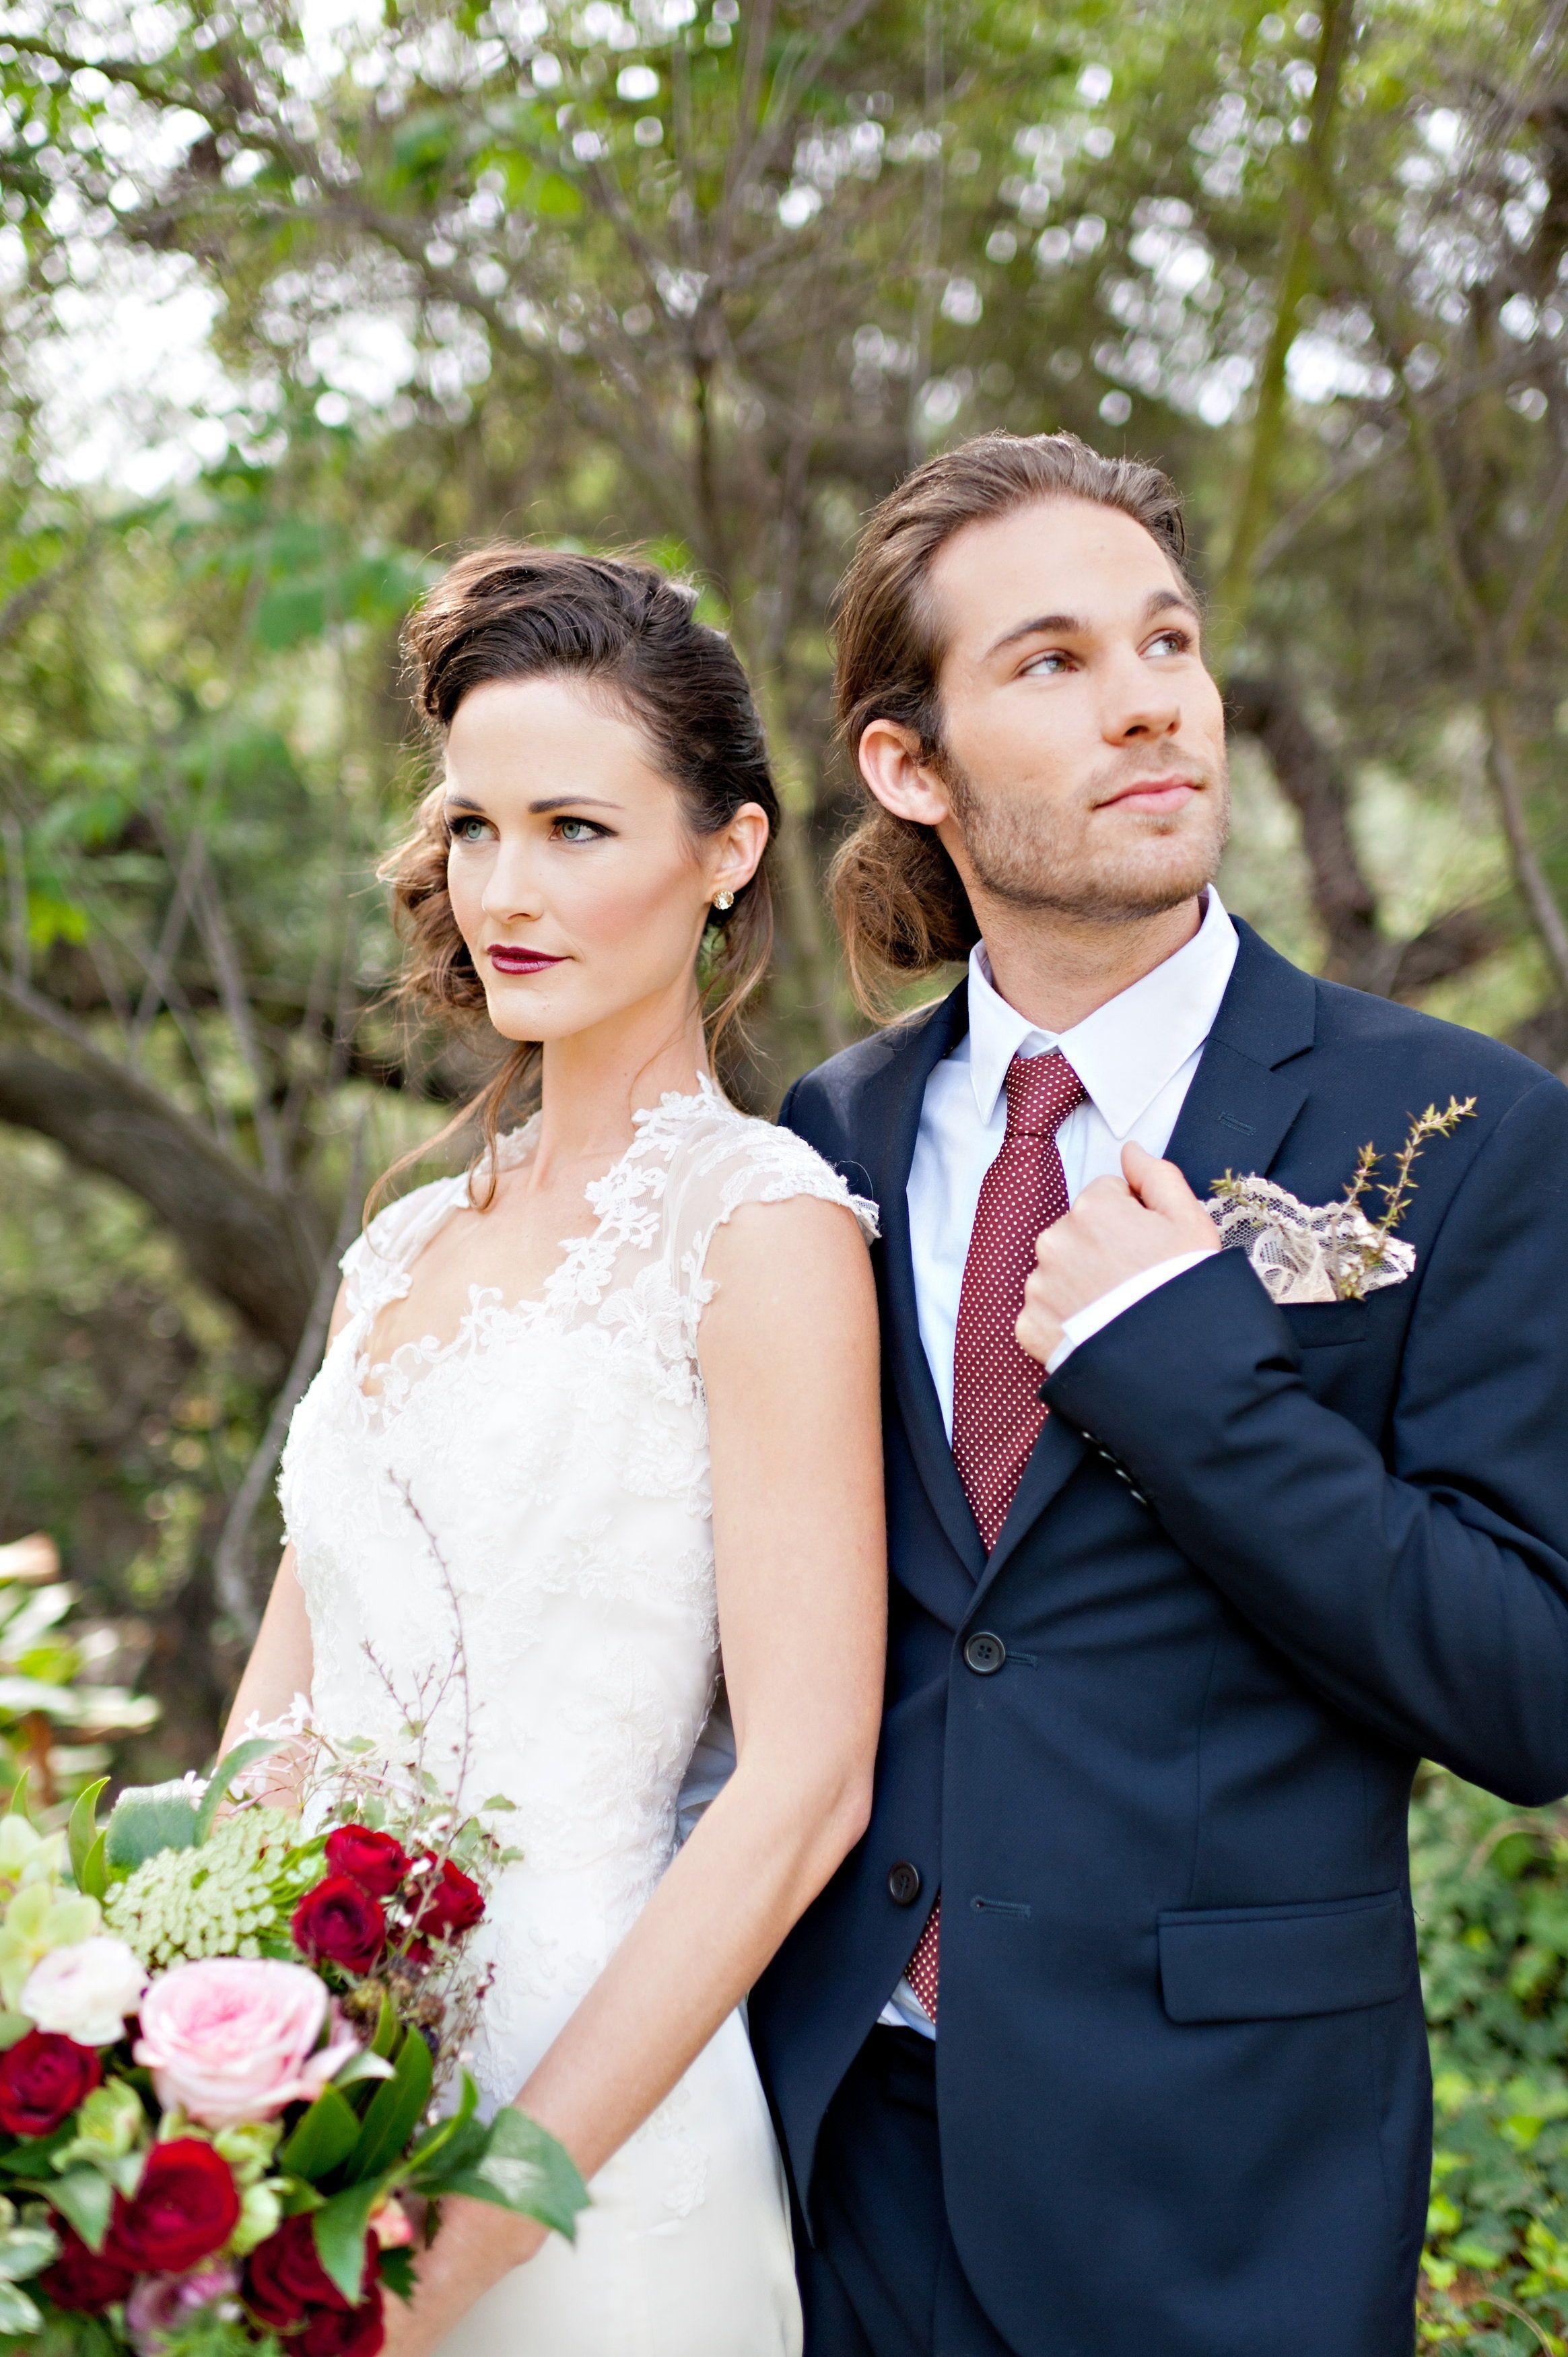 Downton abbey inspired bridal shoot wedding inspiration english tea